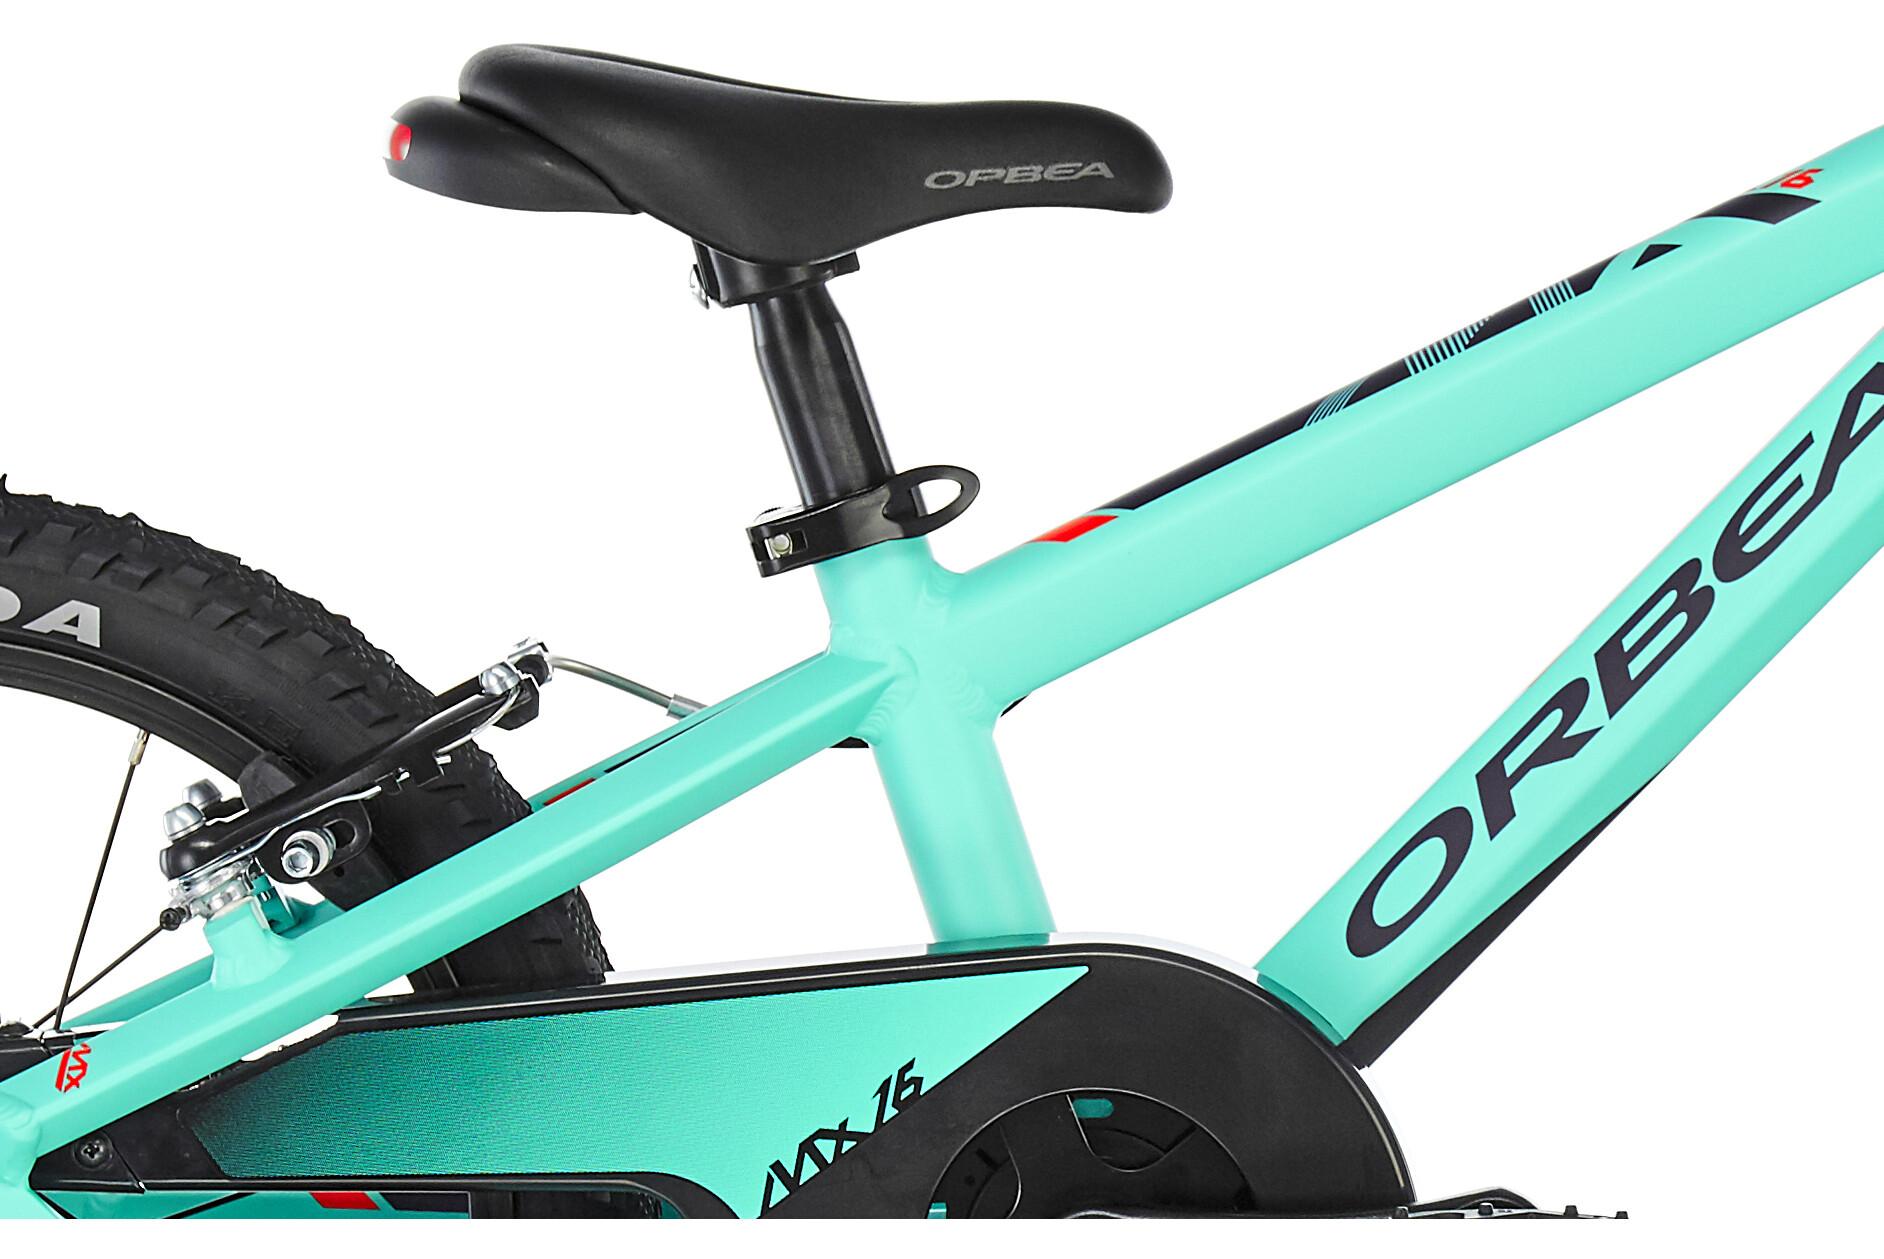 a7665ae5bbdb8 ORBEA MX - Bicicletas para niños - 16 Turquesa